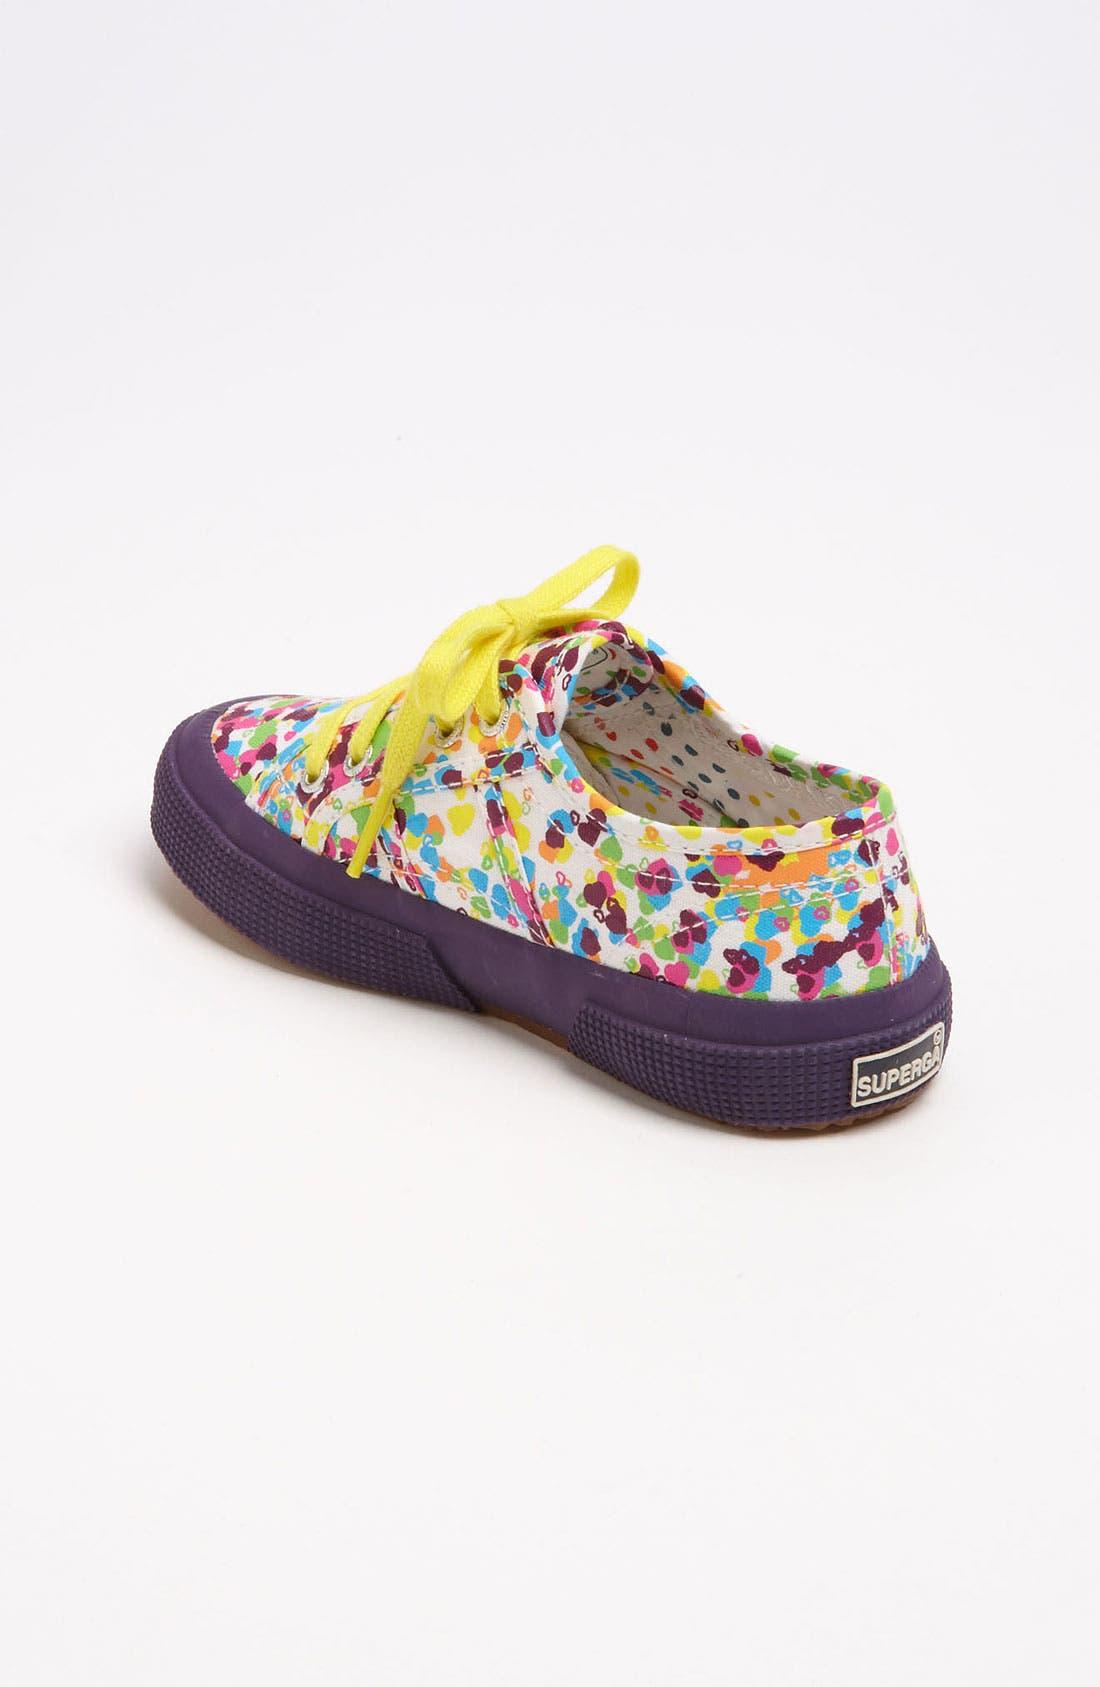 Alternate Image 2  - Superga 'Fantasy Junior Classic' Sneaker (Walker, Toddler, Little Kid & Big Kid)